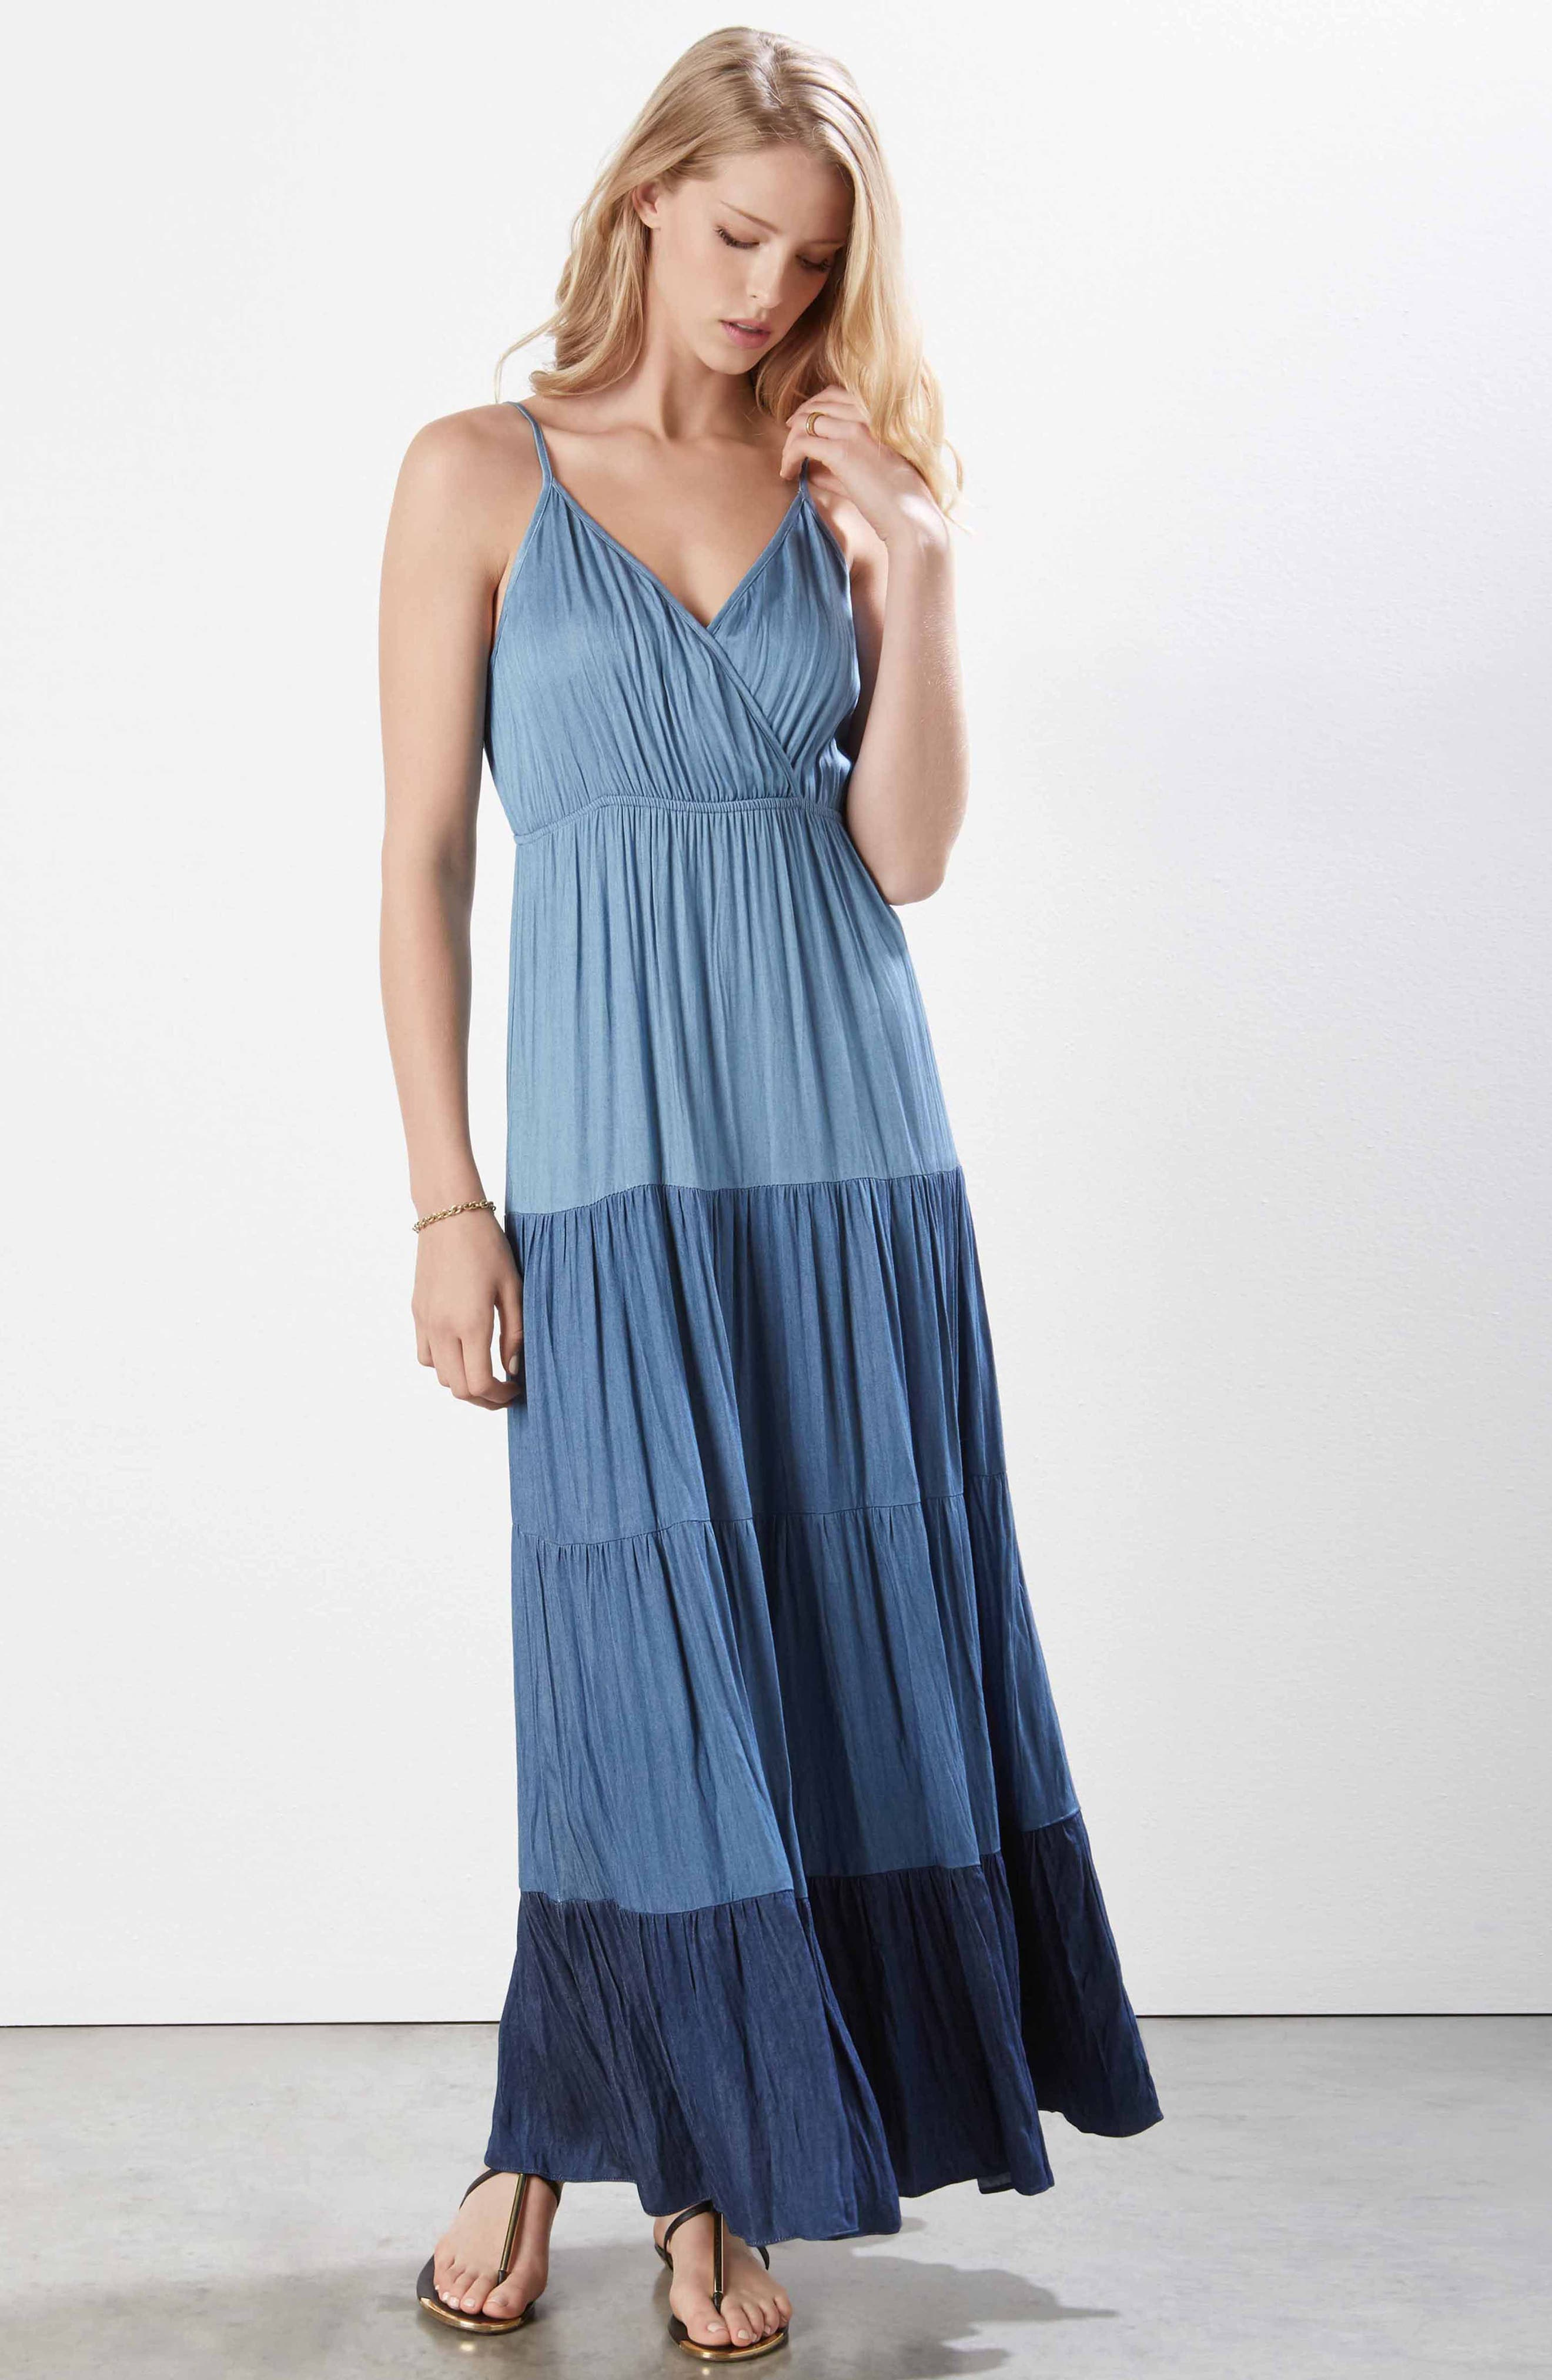 Tiered Chambray Maxi Dress,                             Alternate thumbnail 2, color,                             488